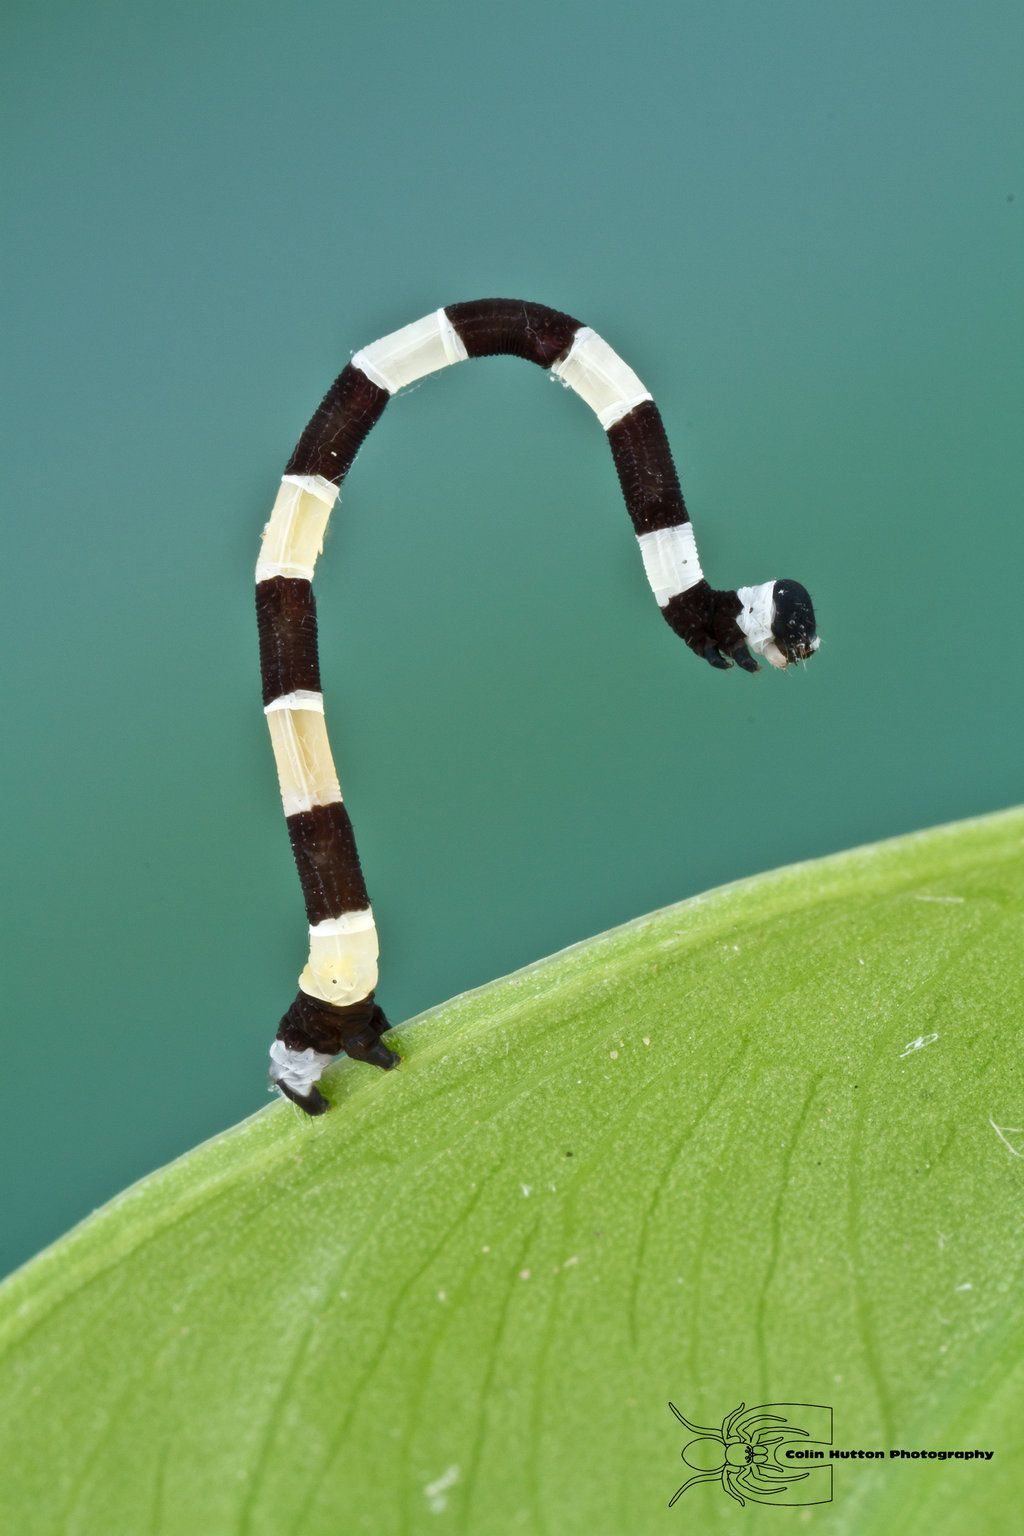 Caterpillar from Colombia by ColinHuttonPhoto.deviantart.com on @DeviantArt